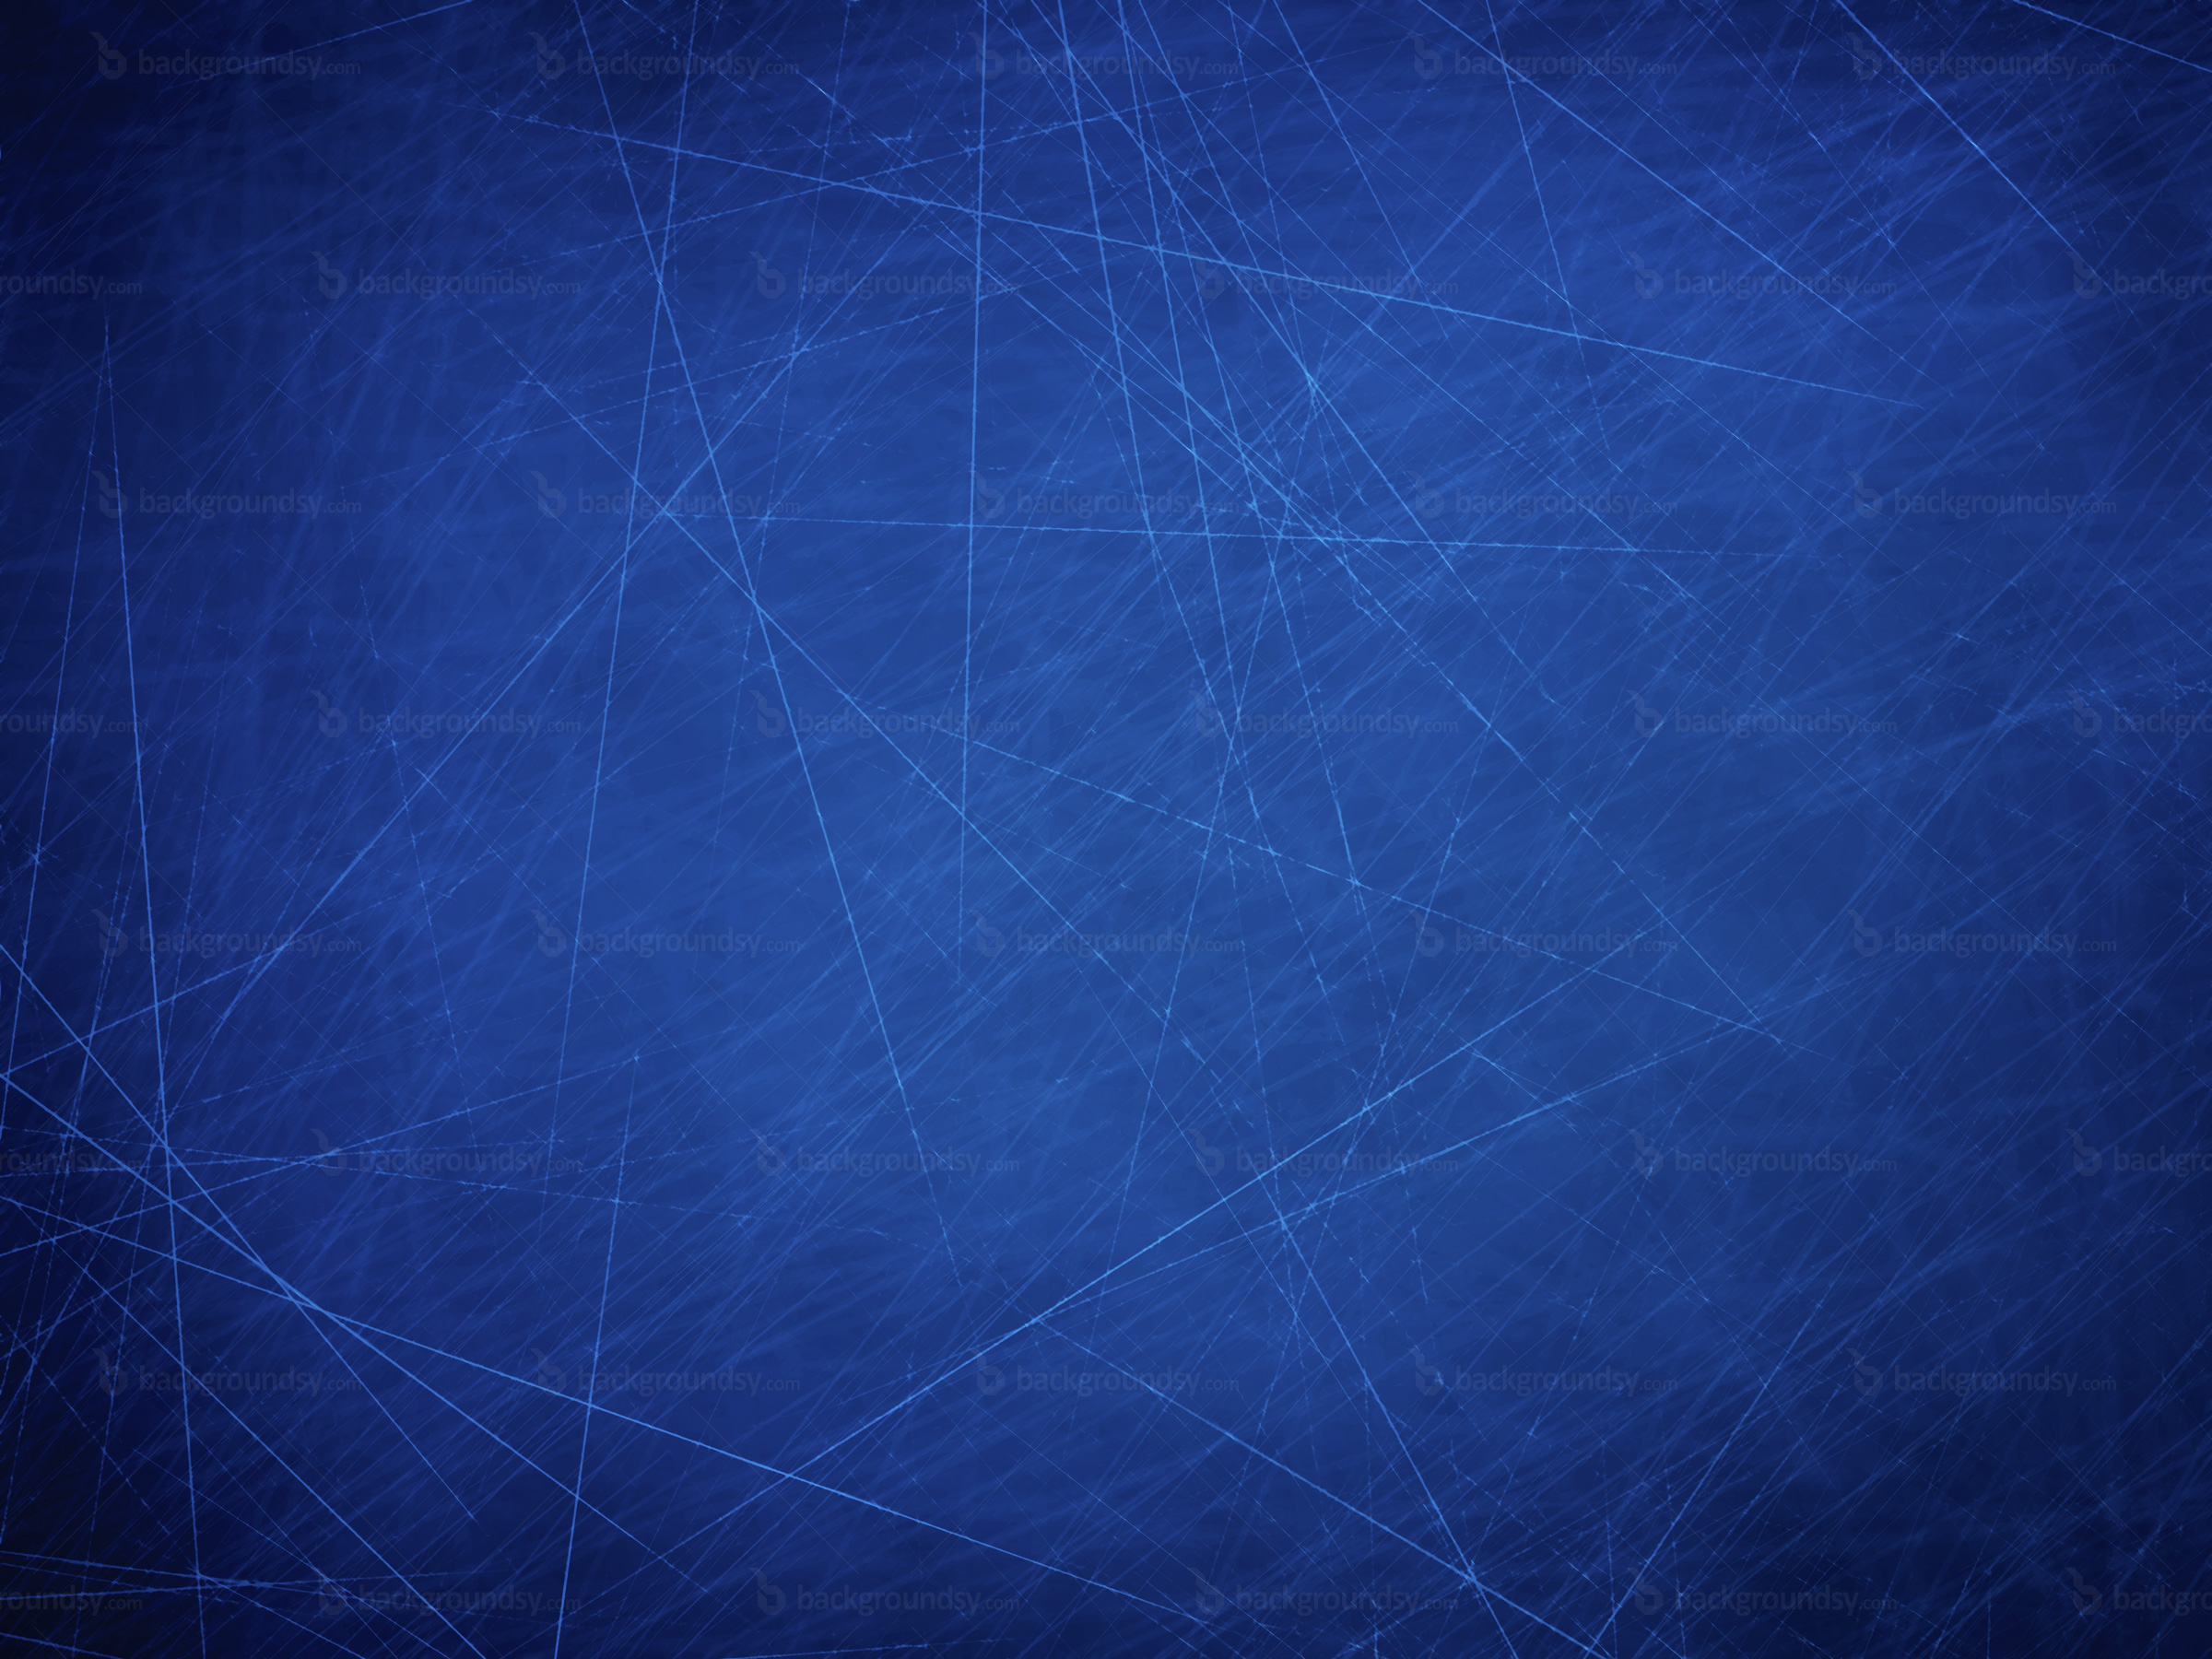 Blue steel wallpaper wallpapersafari for Fond ecran uni